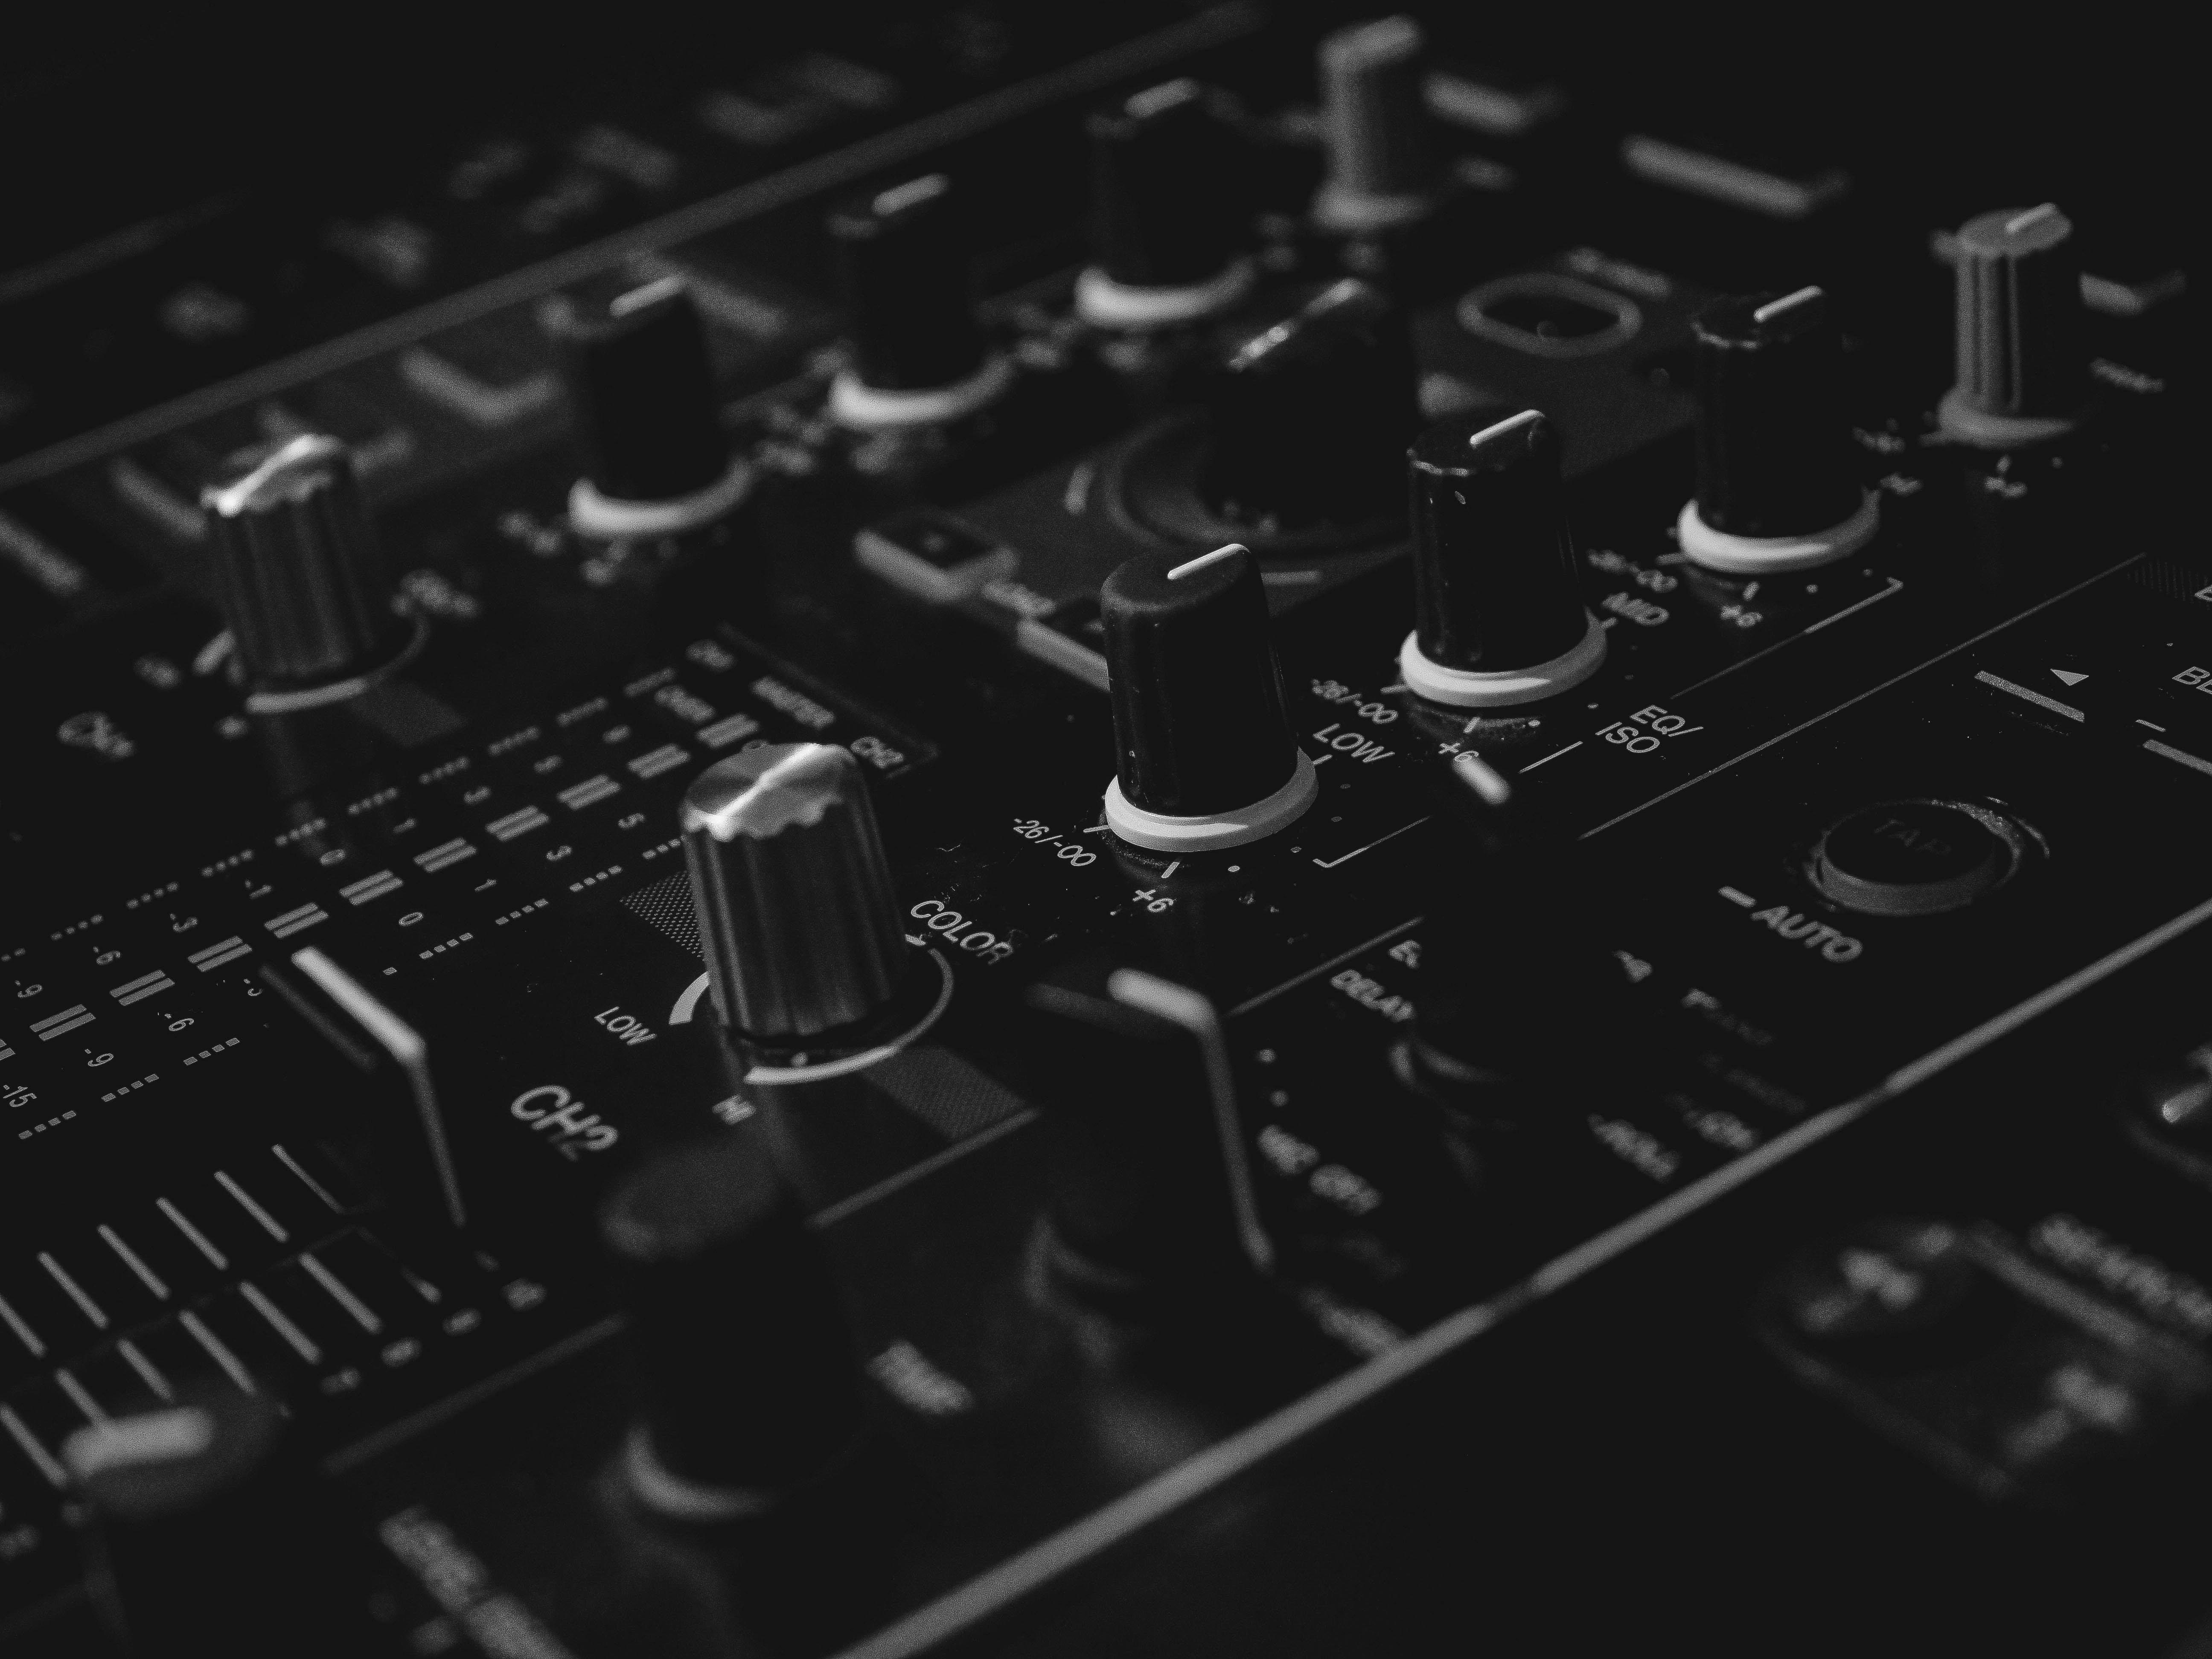 black audio mixer in closeup photography